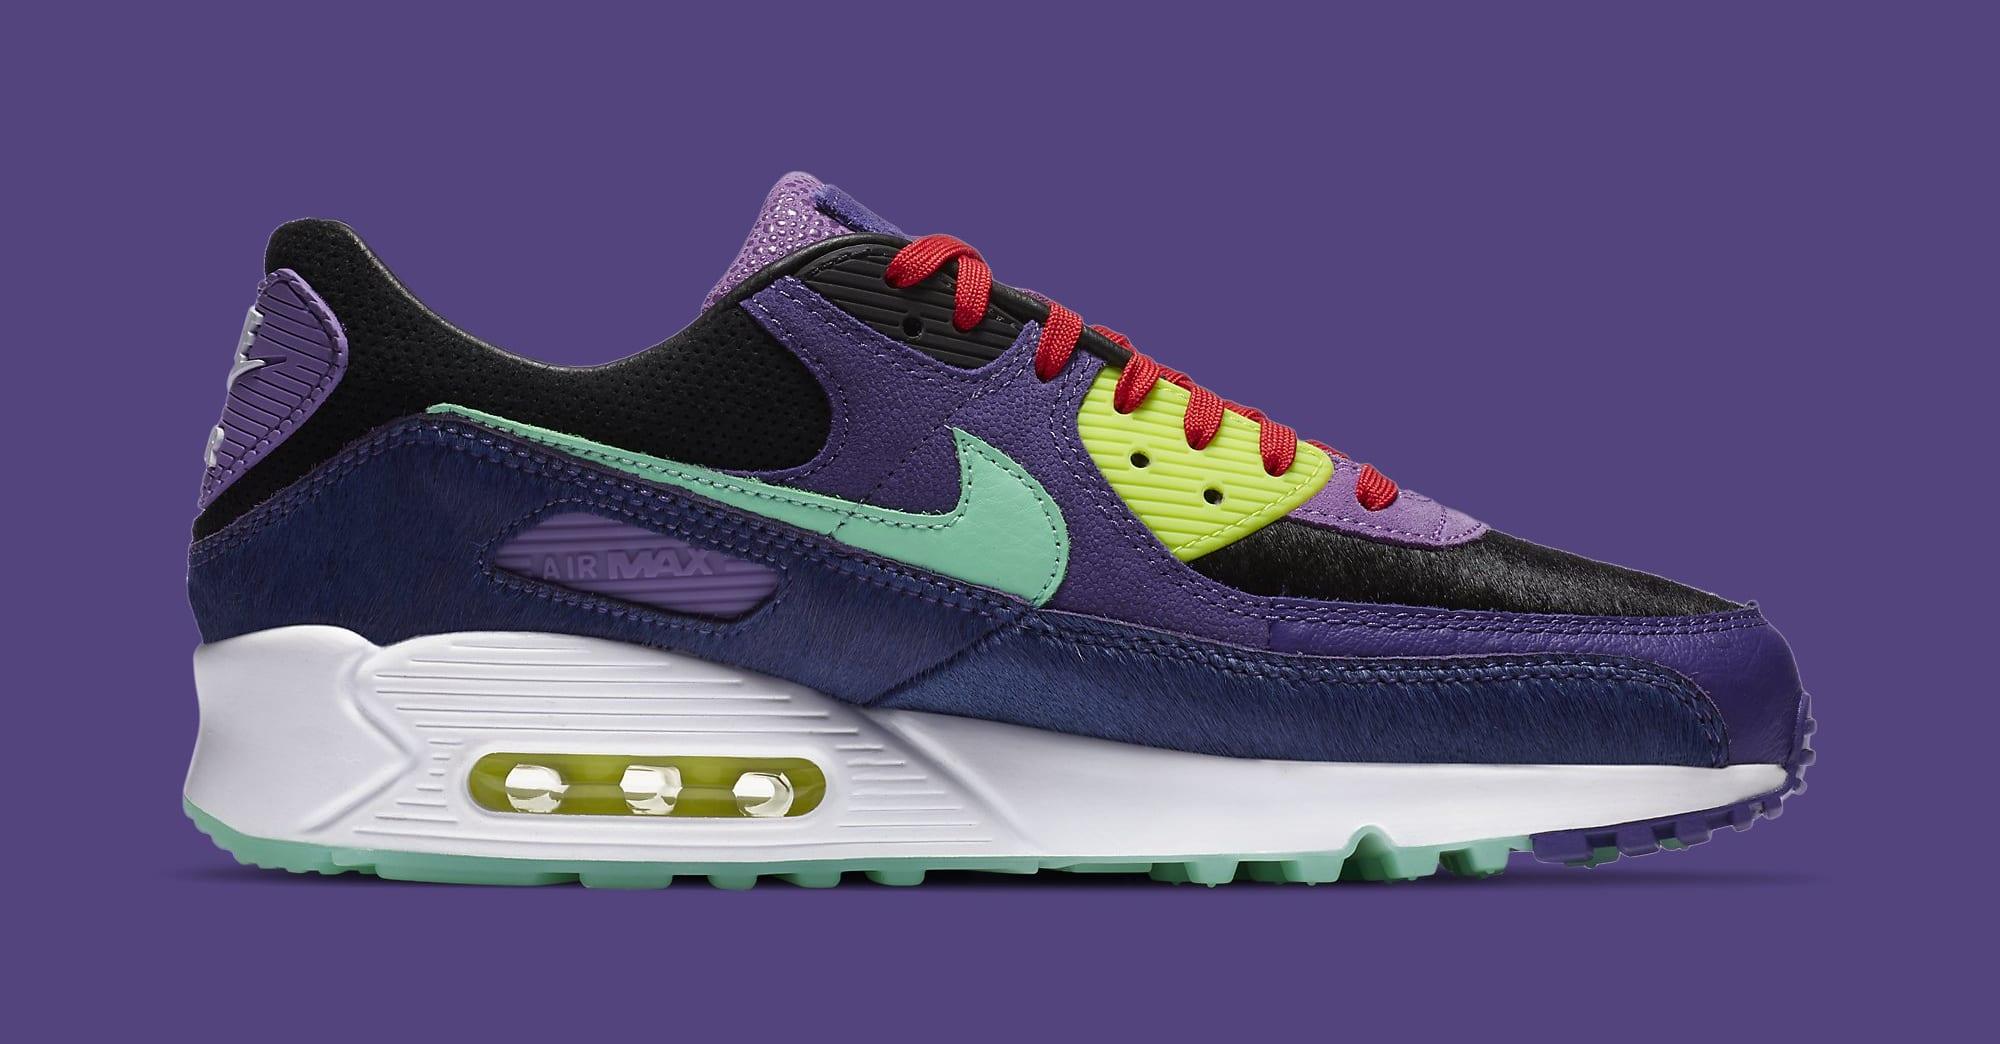 Nike Air Max 90 'Violet Blend' CZ5588-001 Medial